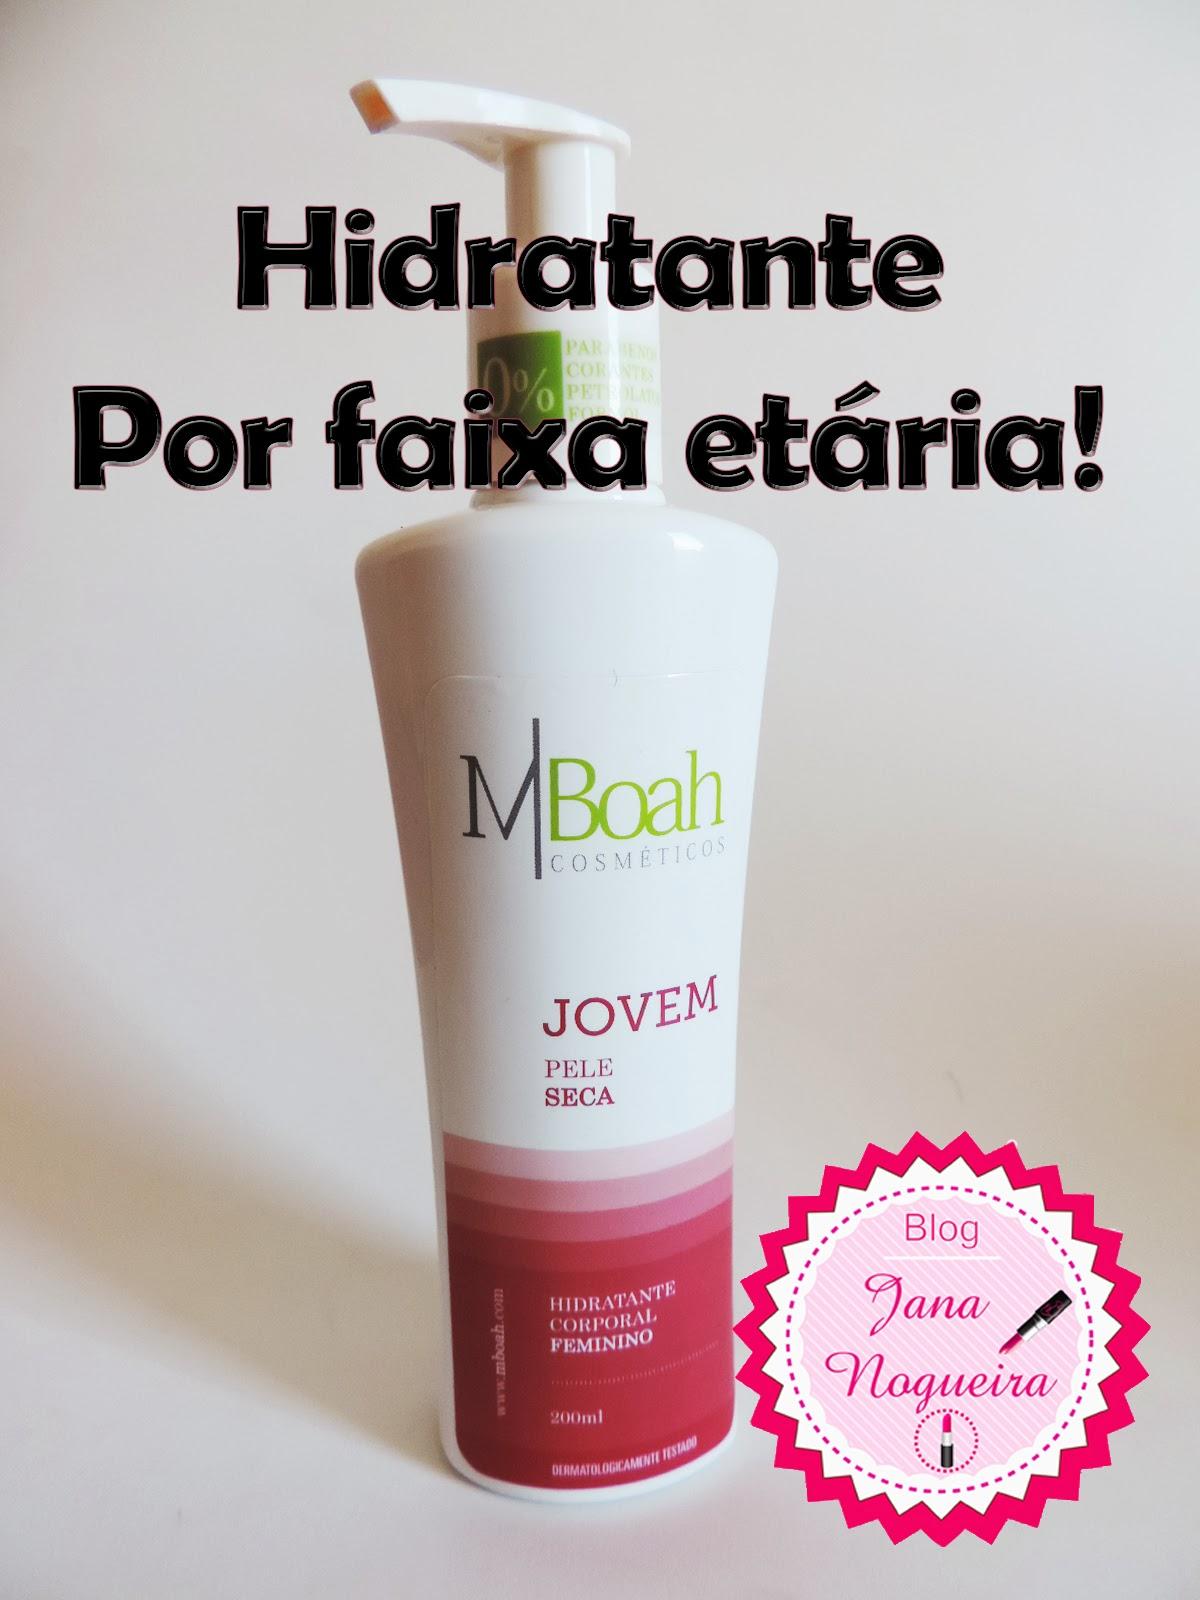 Hidratante Ideal para sua idade - MBOAH